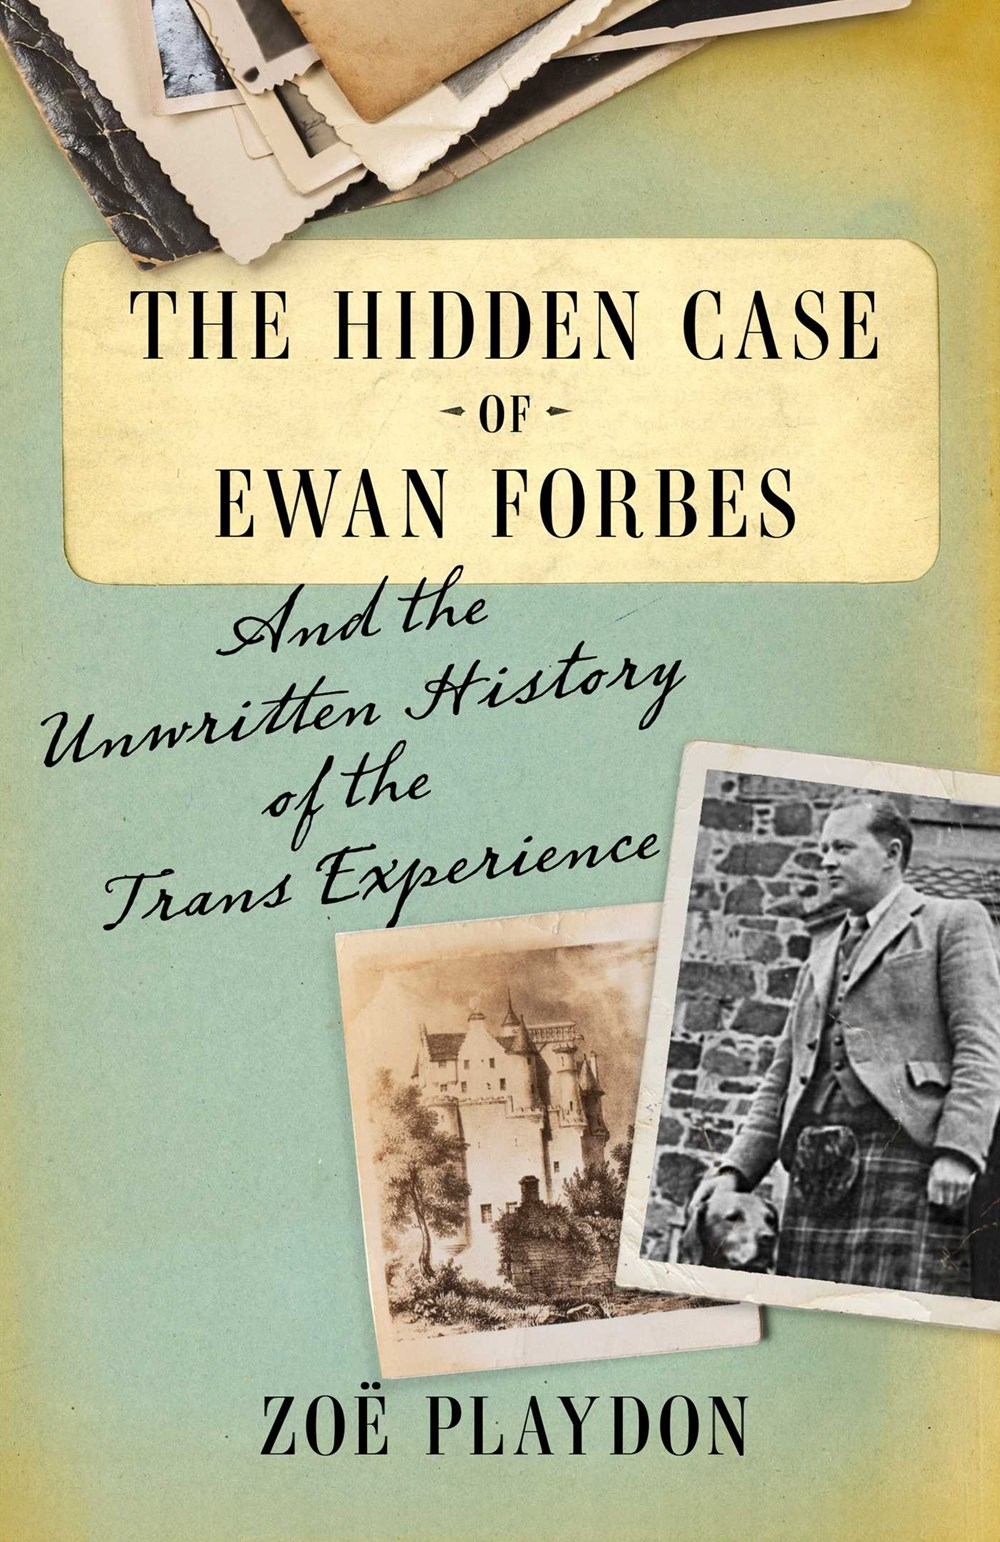 The Hidden Case of Ewan Forbes cover image